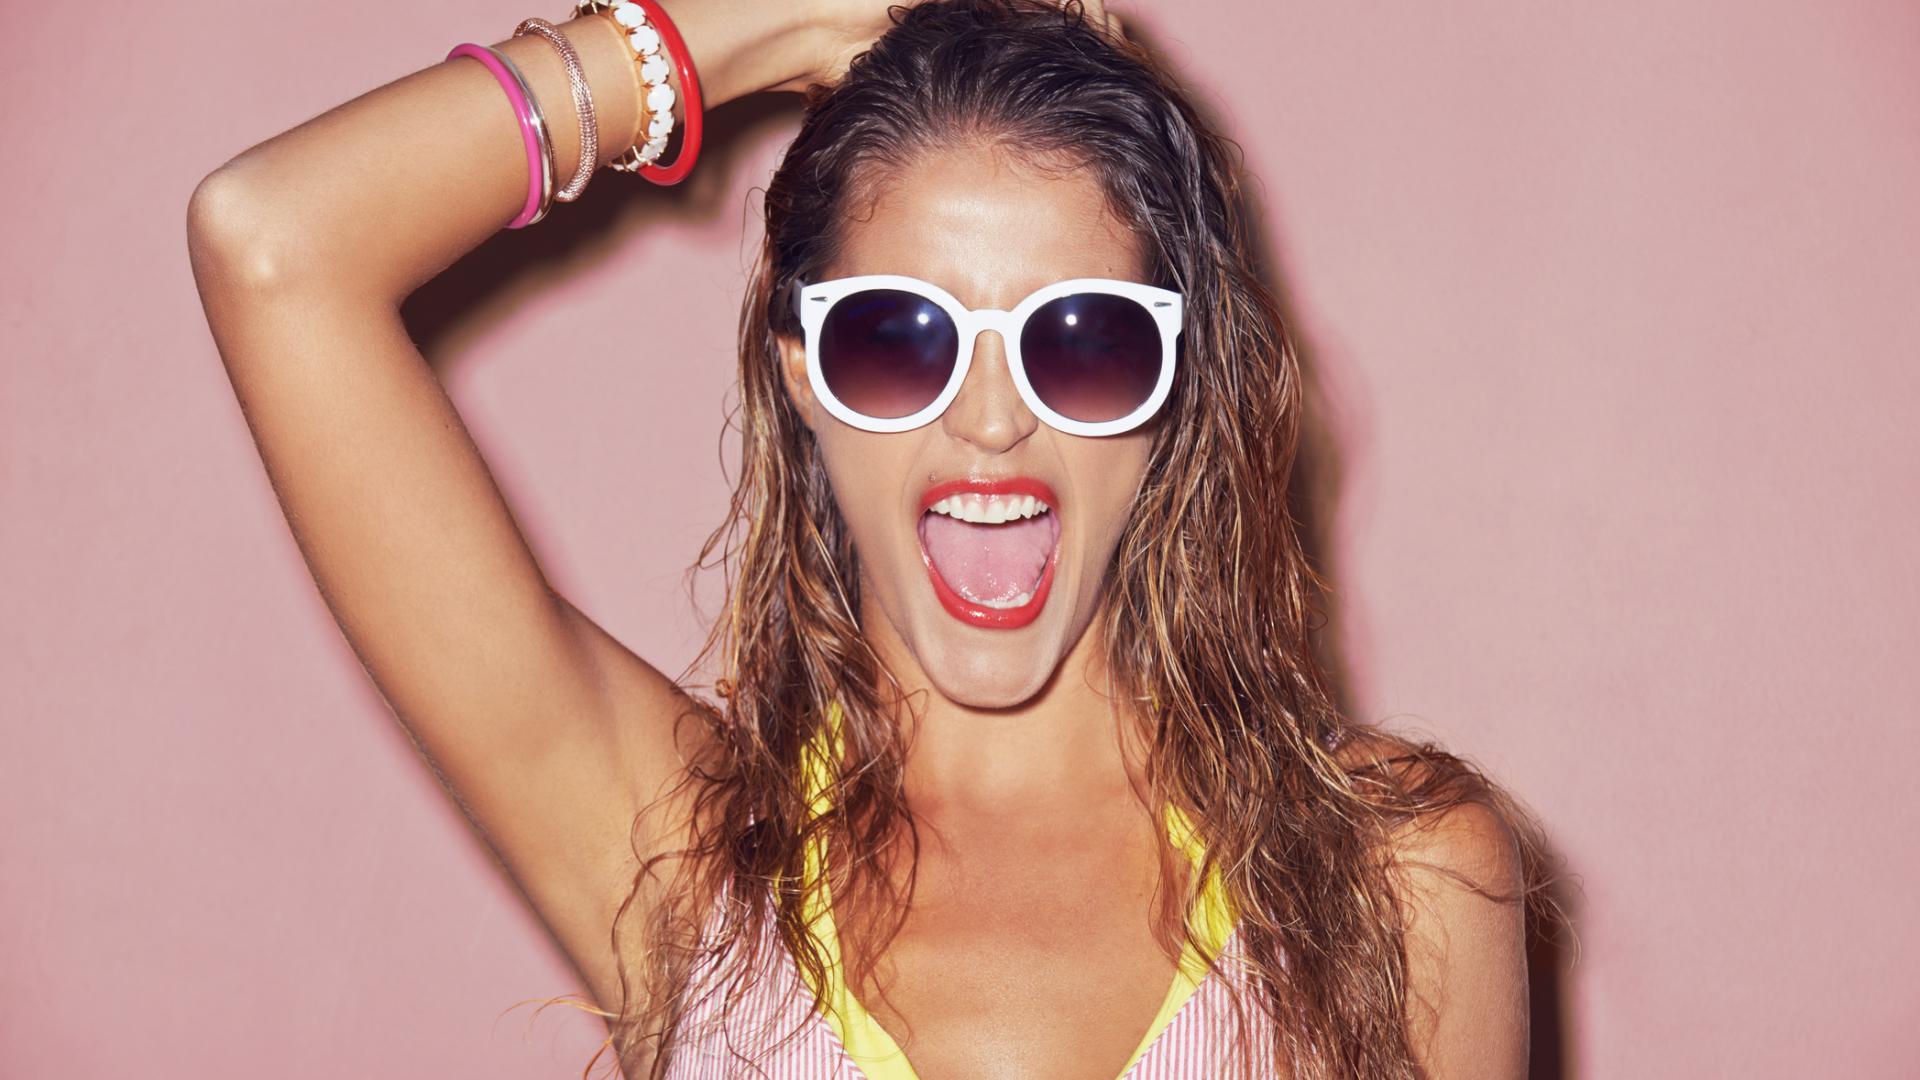 Haare ausfetten lassen frau sommer nass bikini sonnenbrille